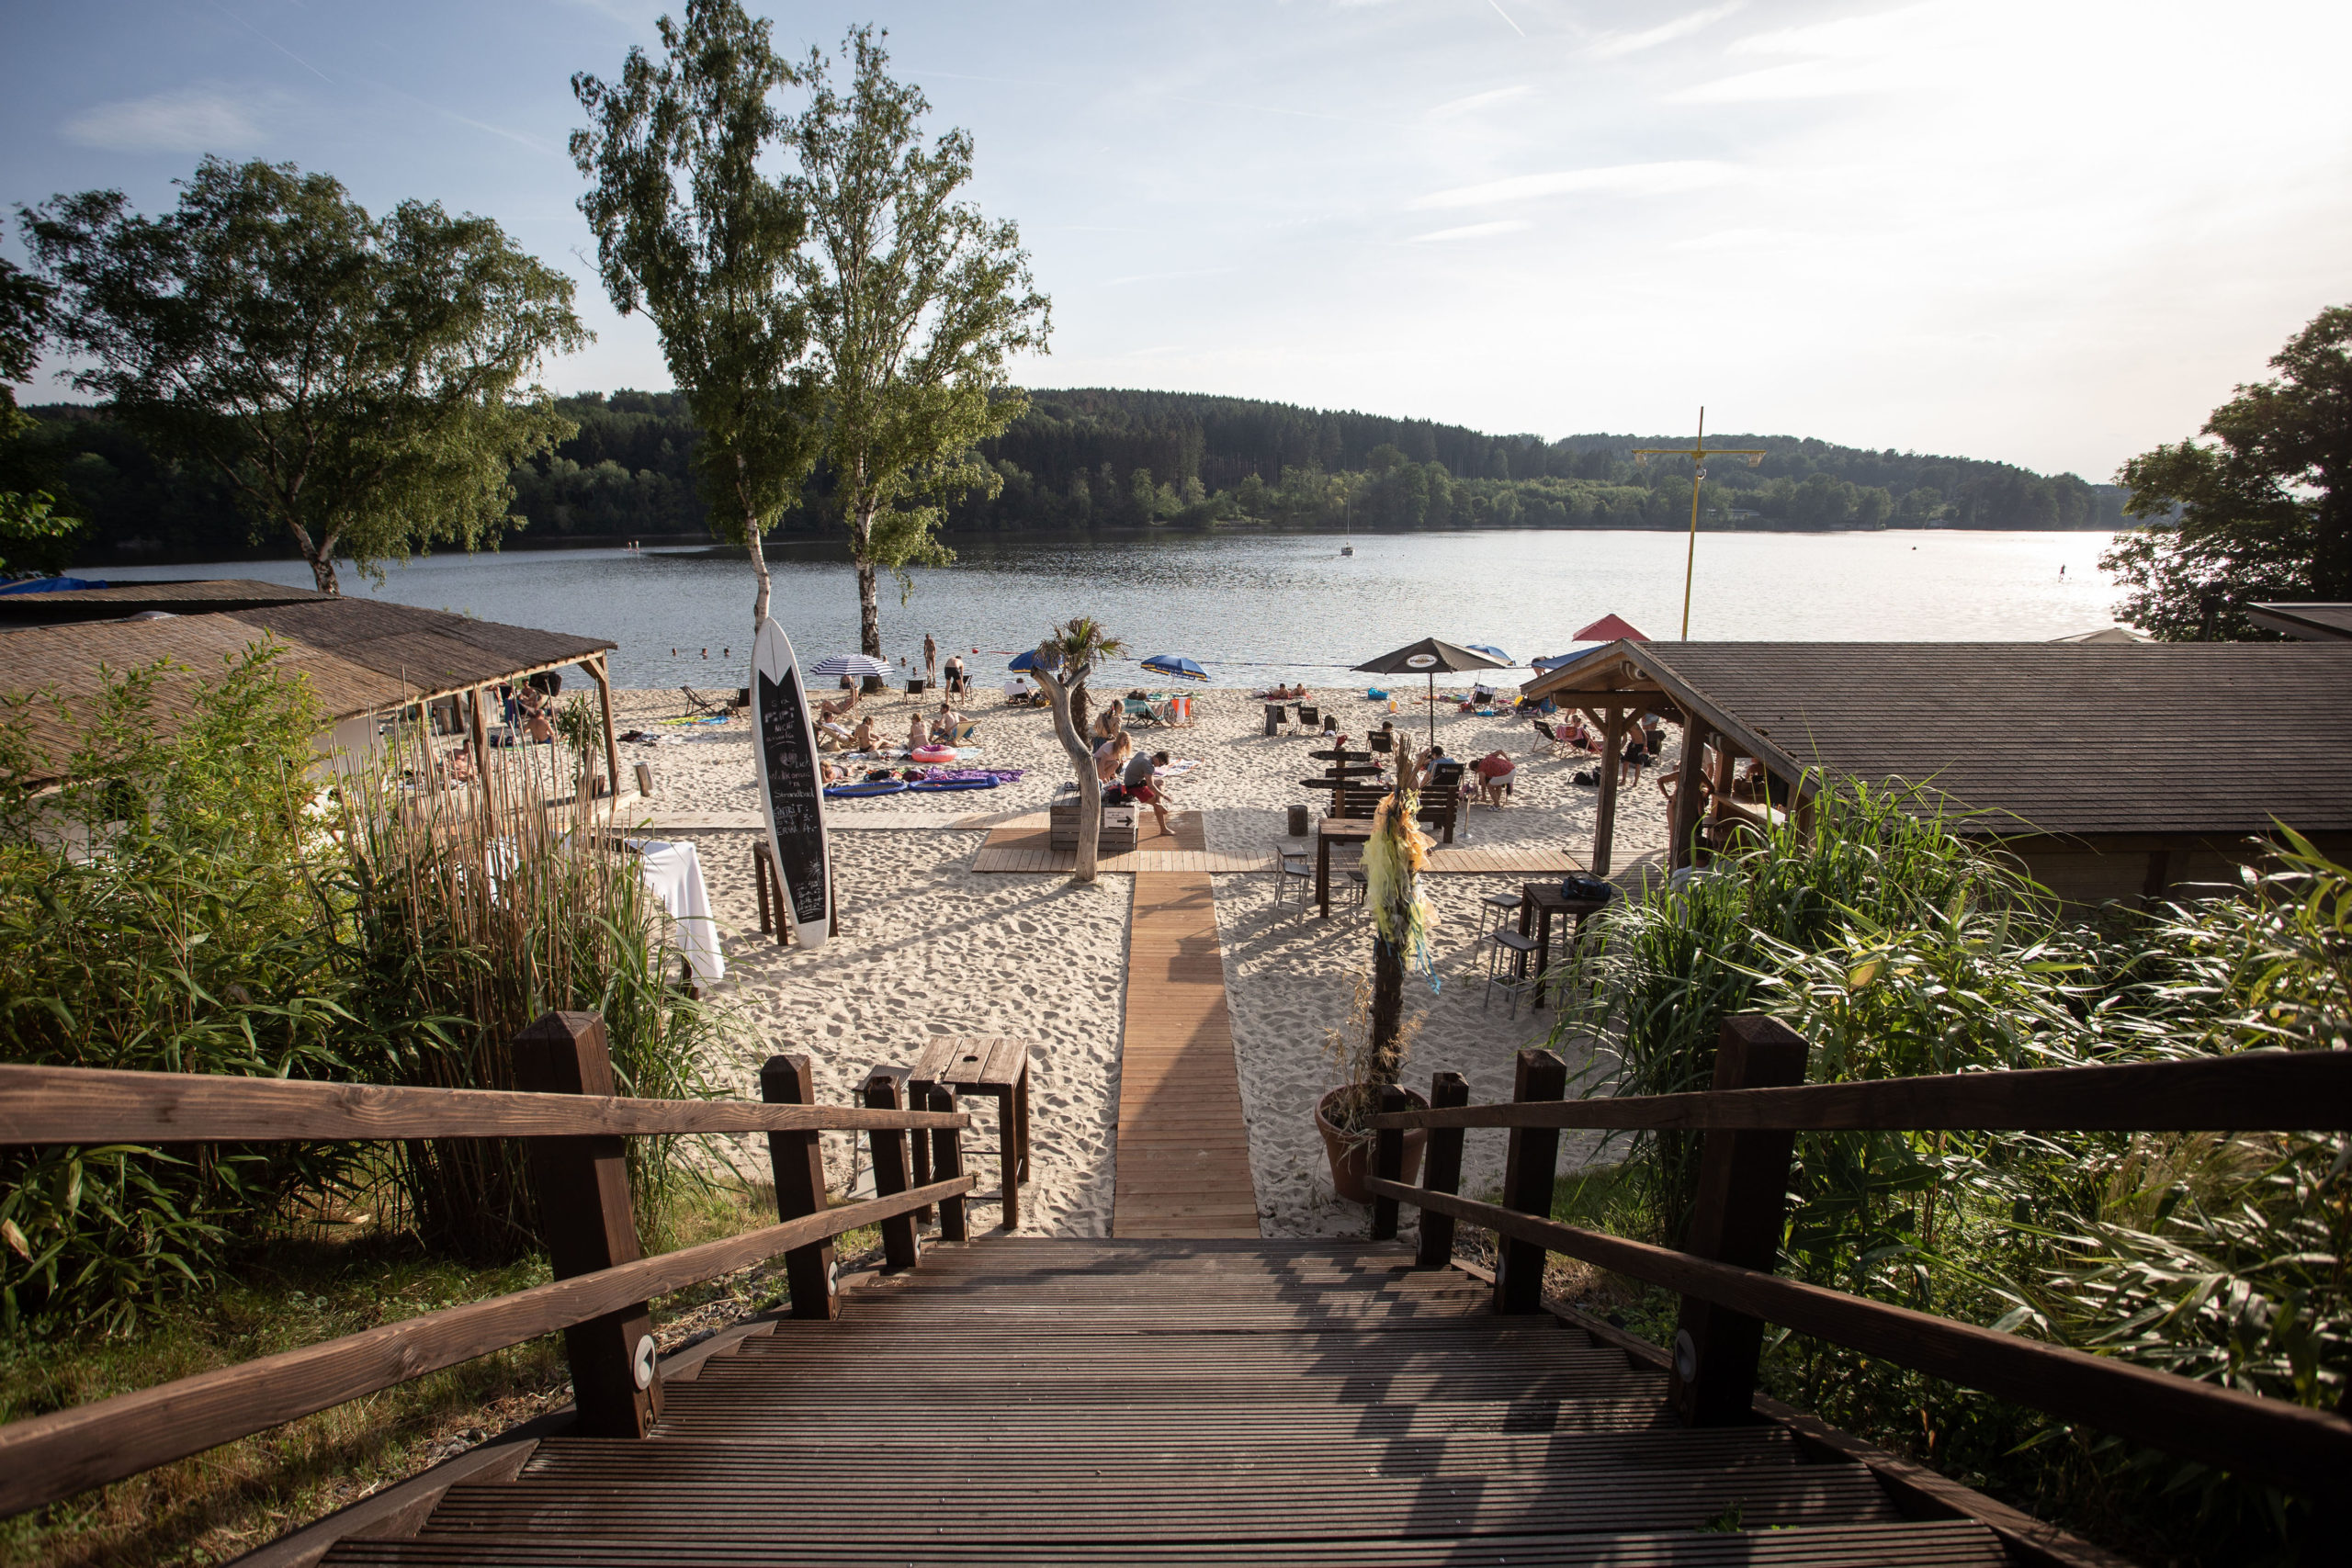 Strandbad am Möhnesee - Seen